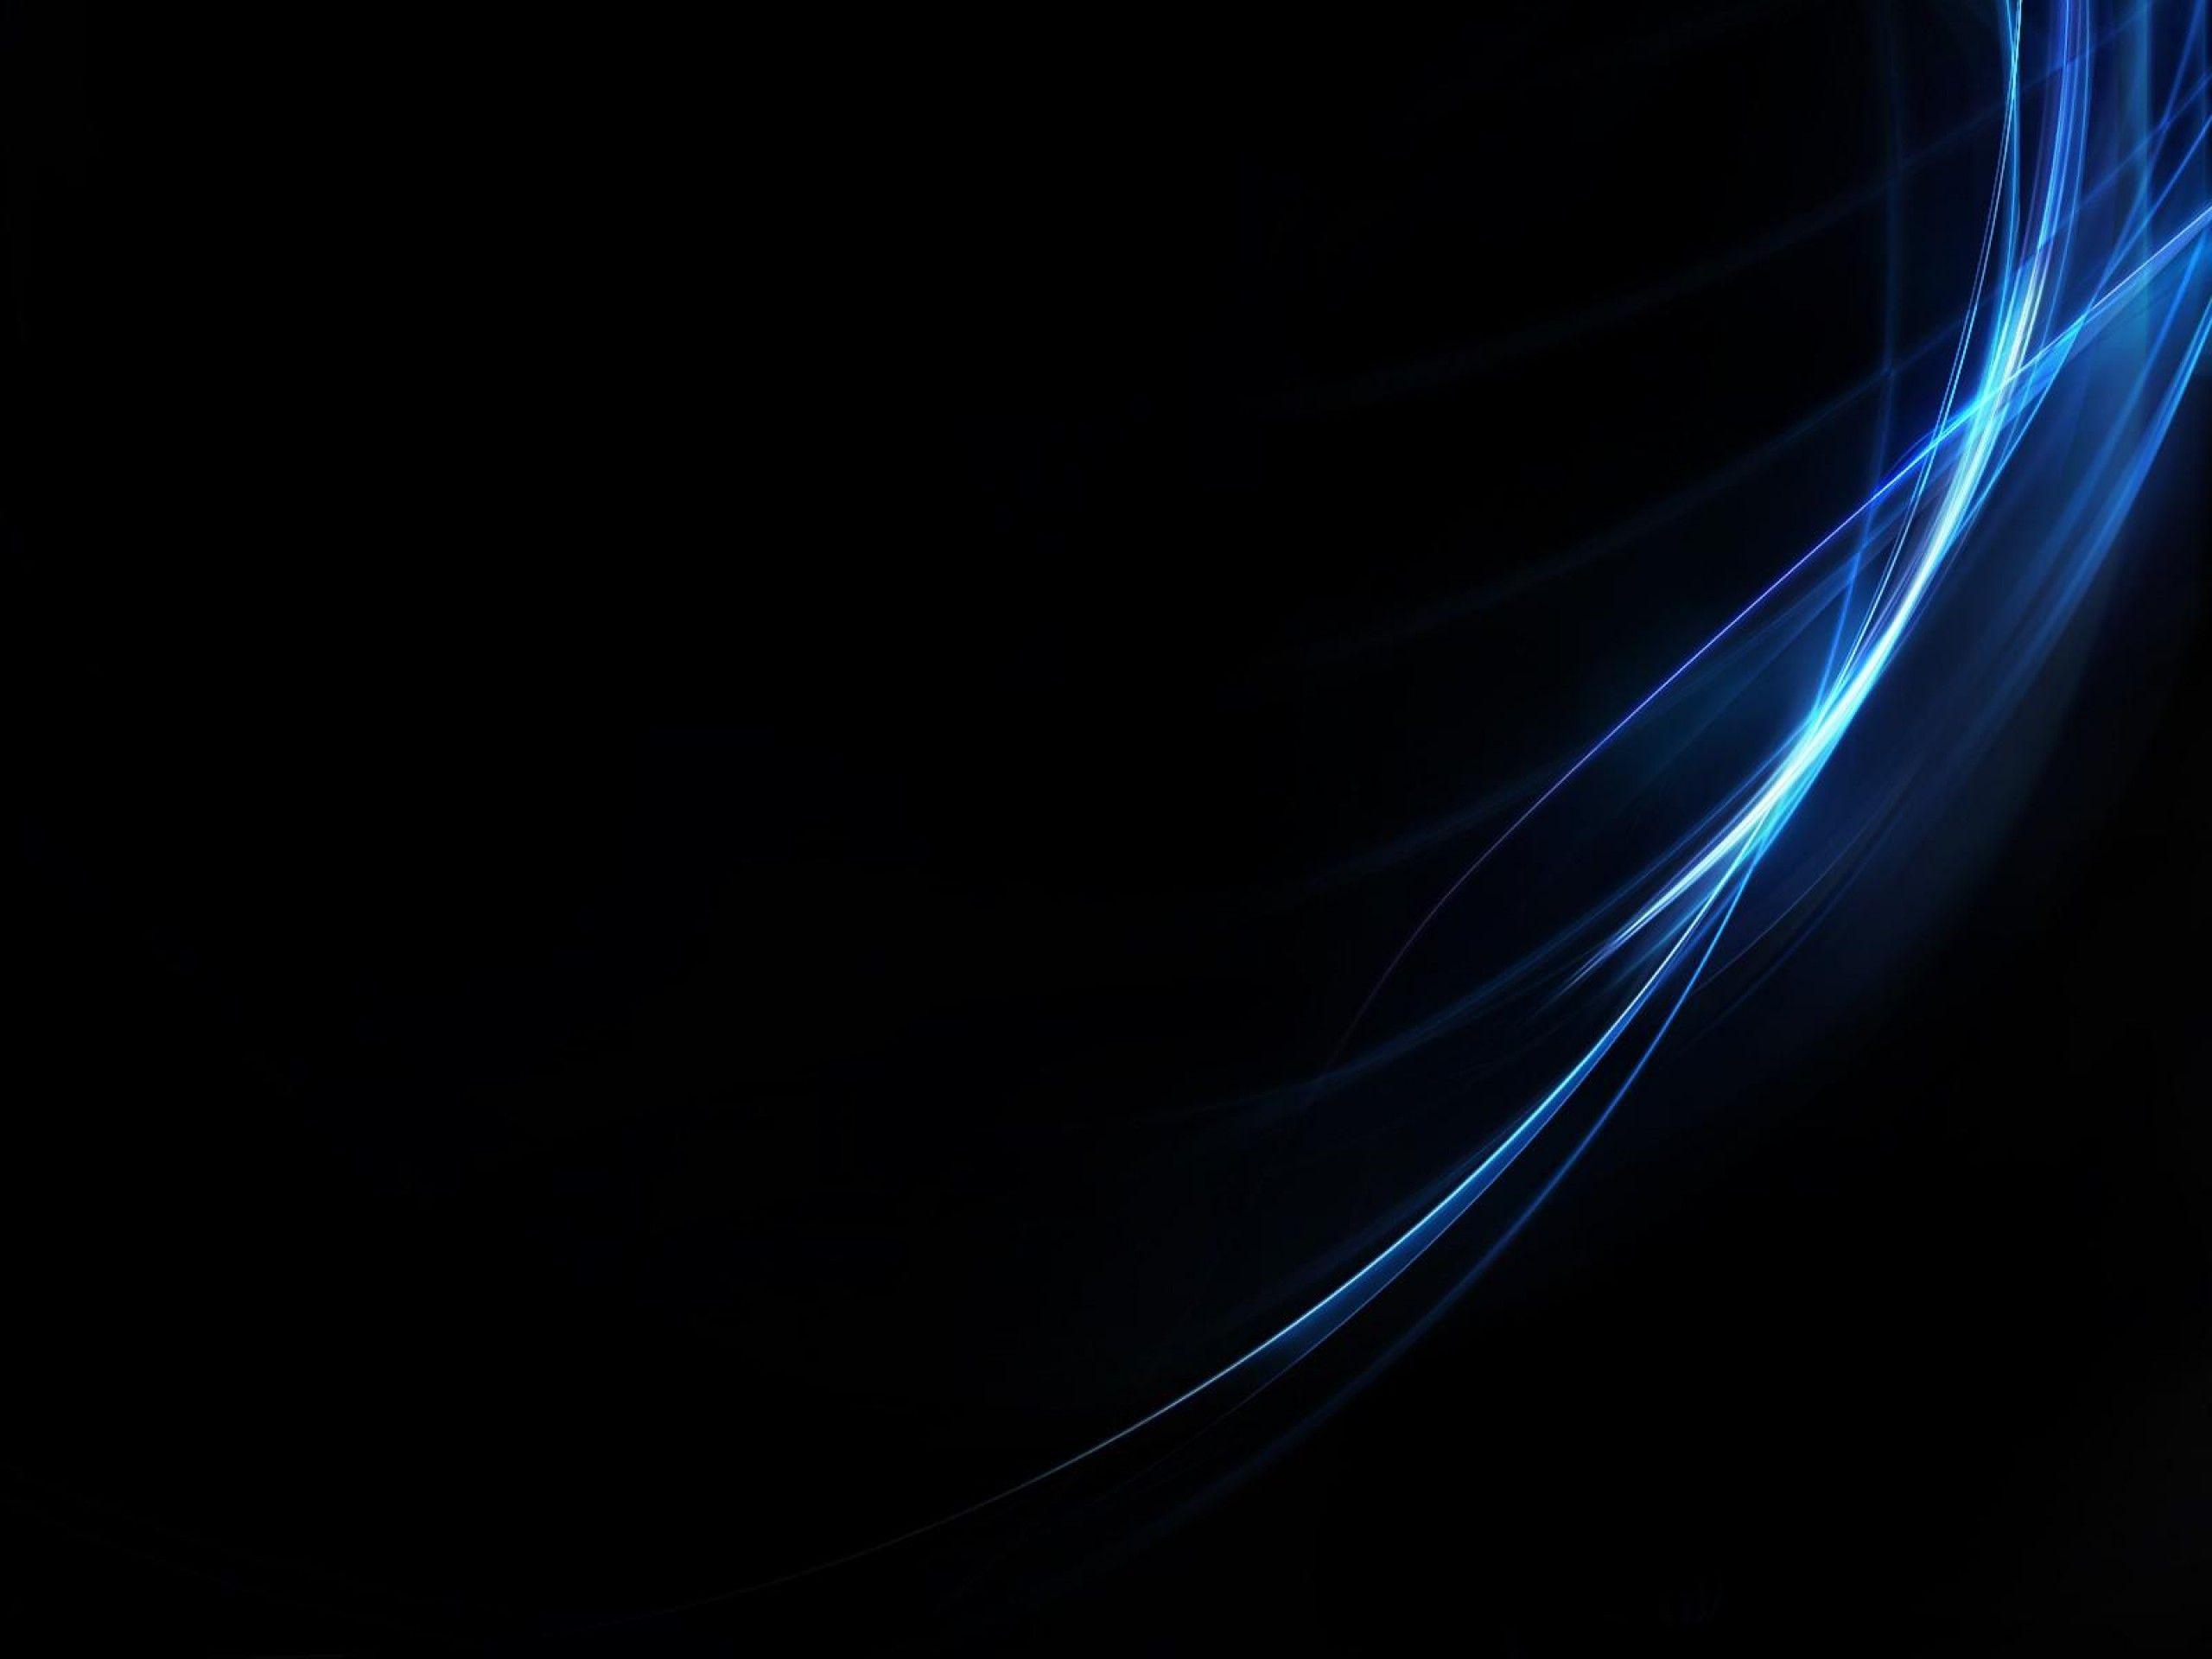 Dark Blue Wallpaper For Windows Lzt Black Blue Wallpaper Dark